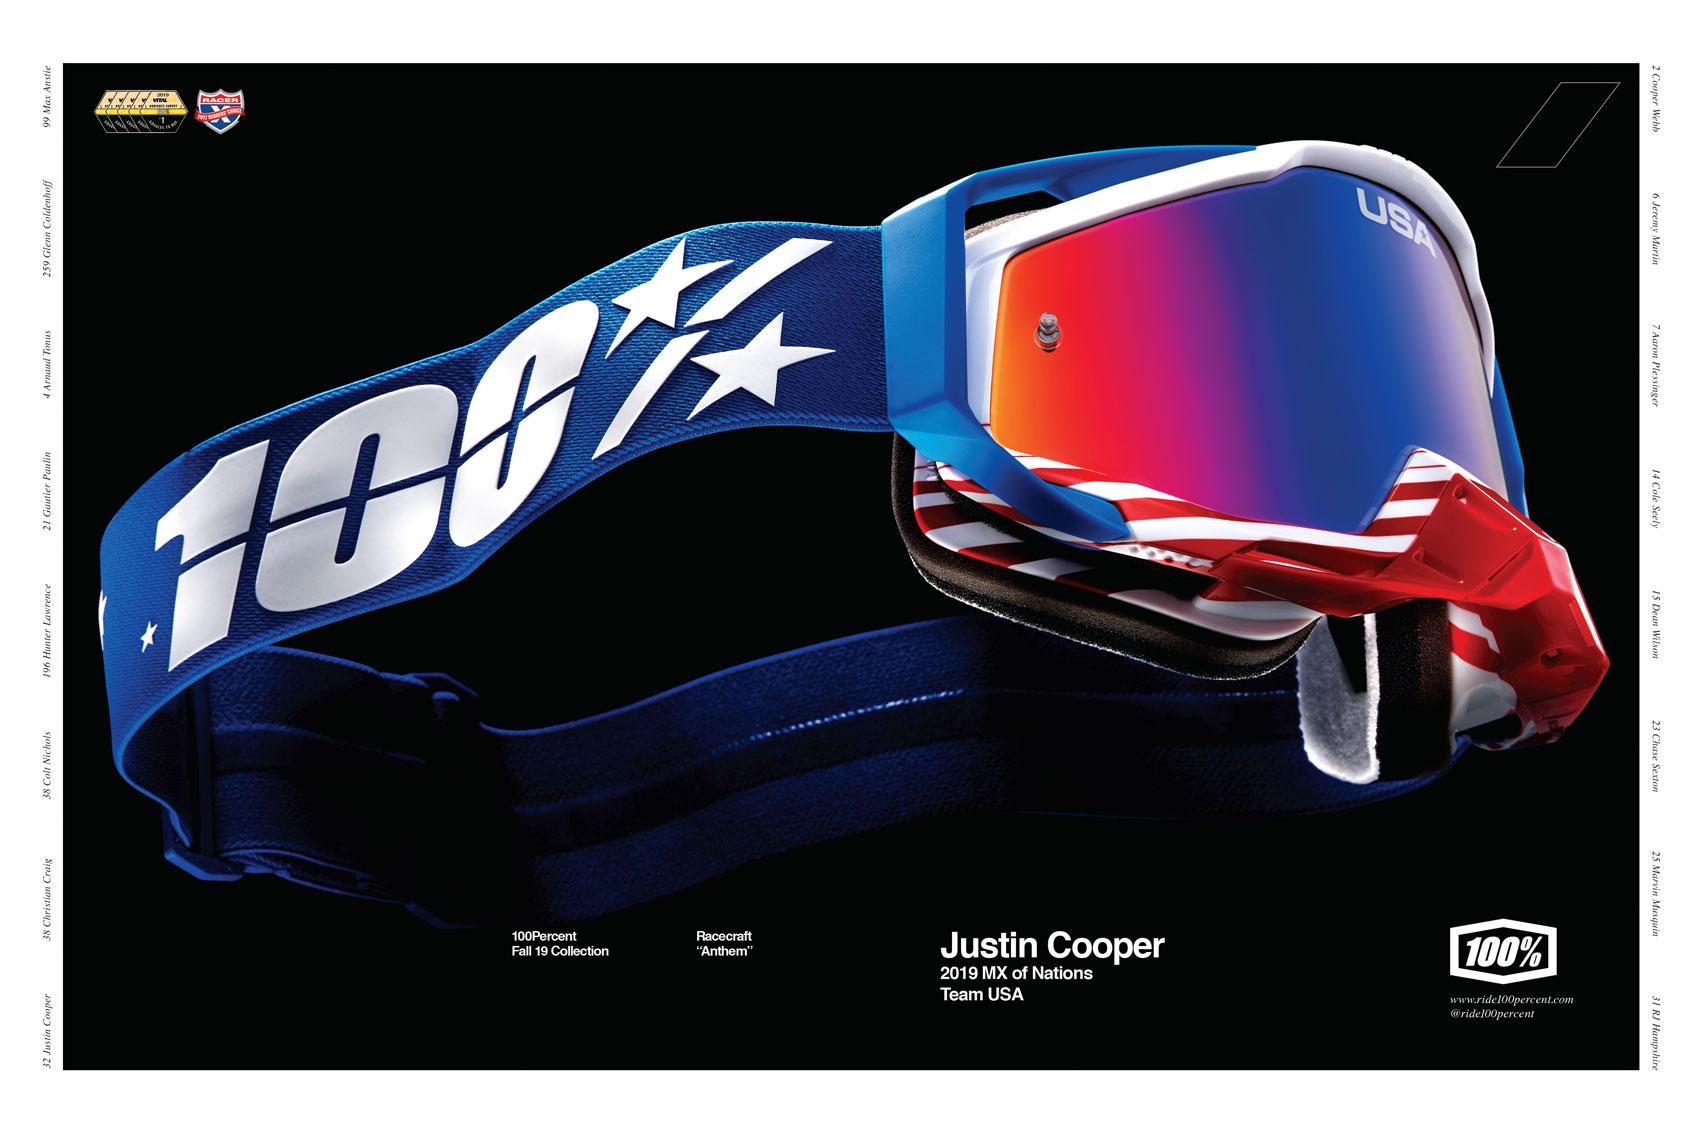 Racer X December 2019 - Ride 100 Precent Advertisement